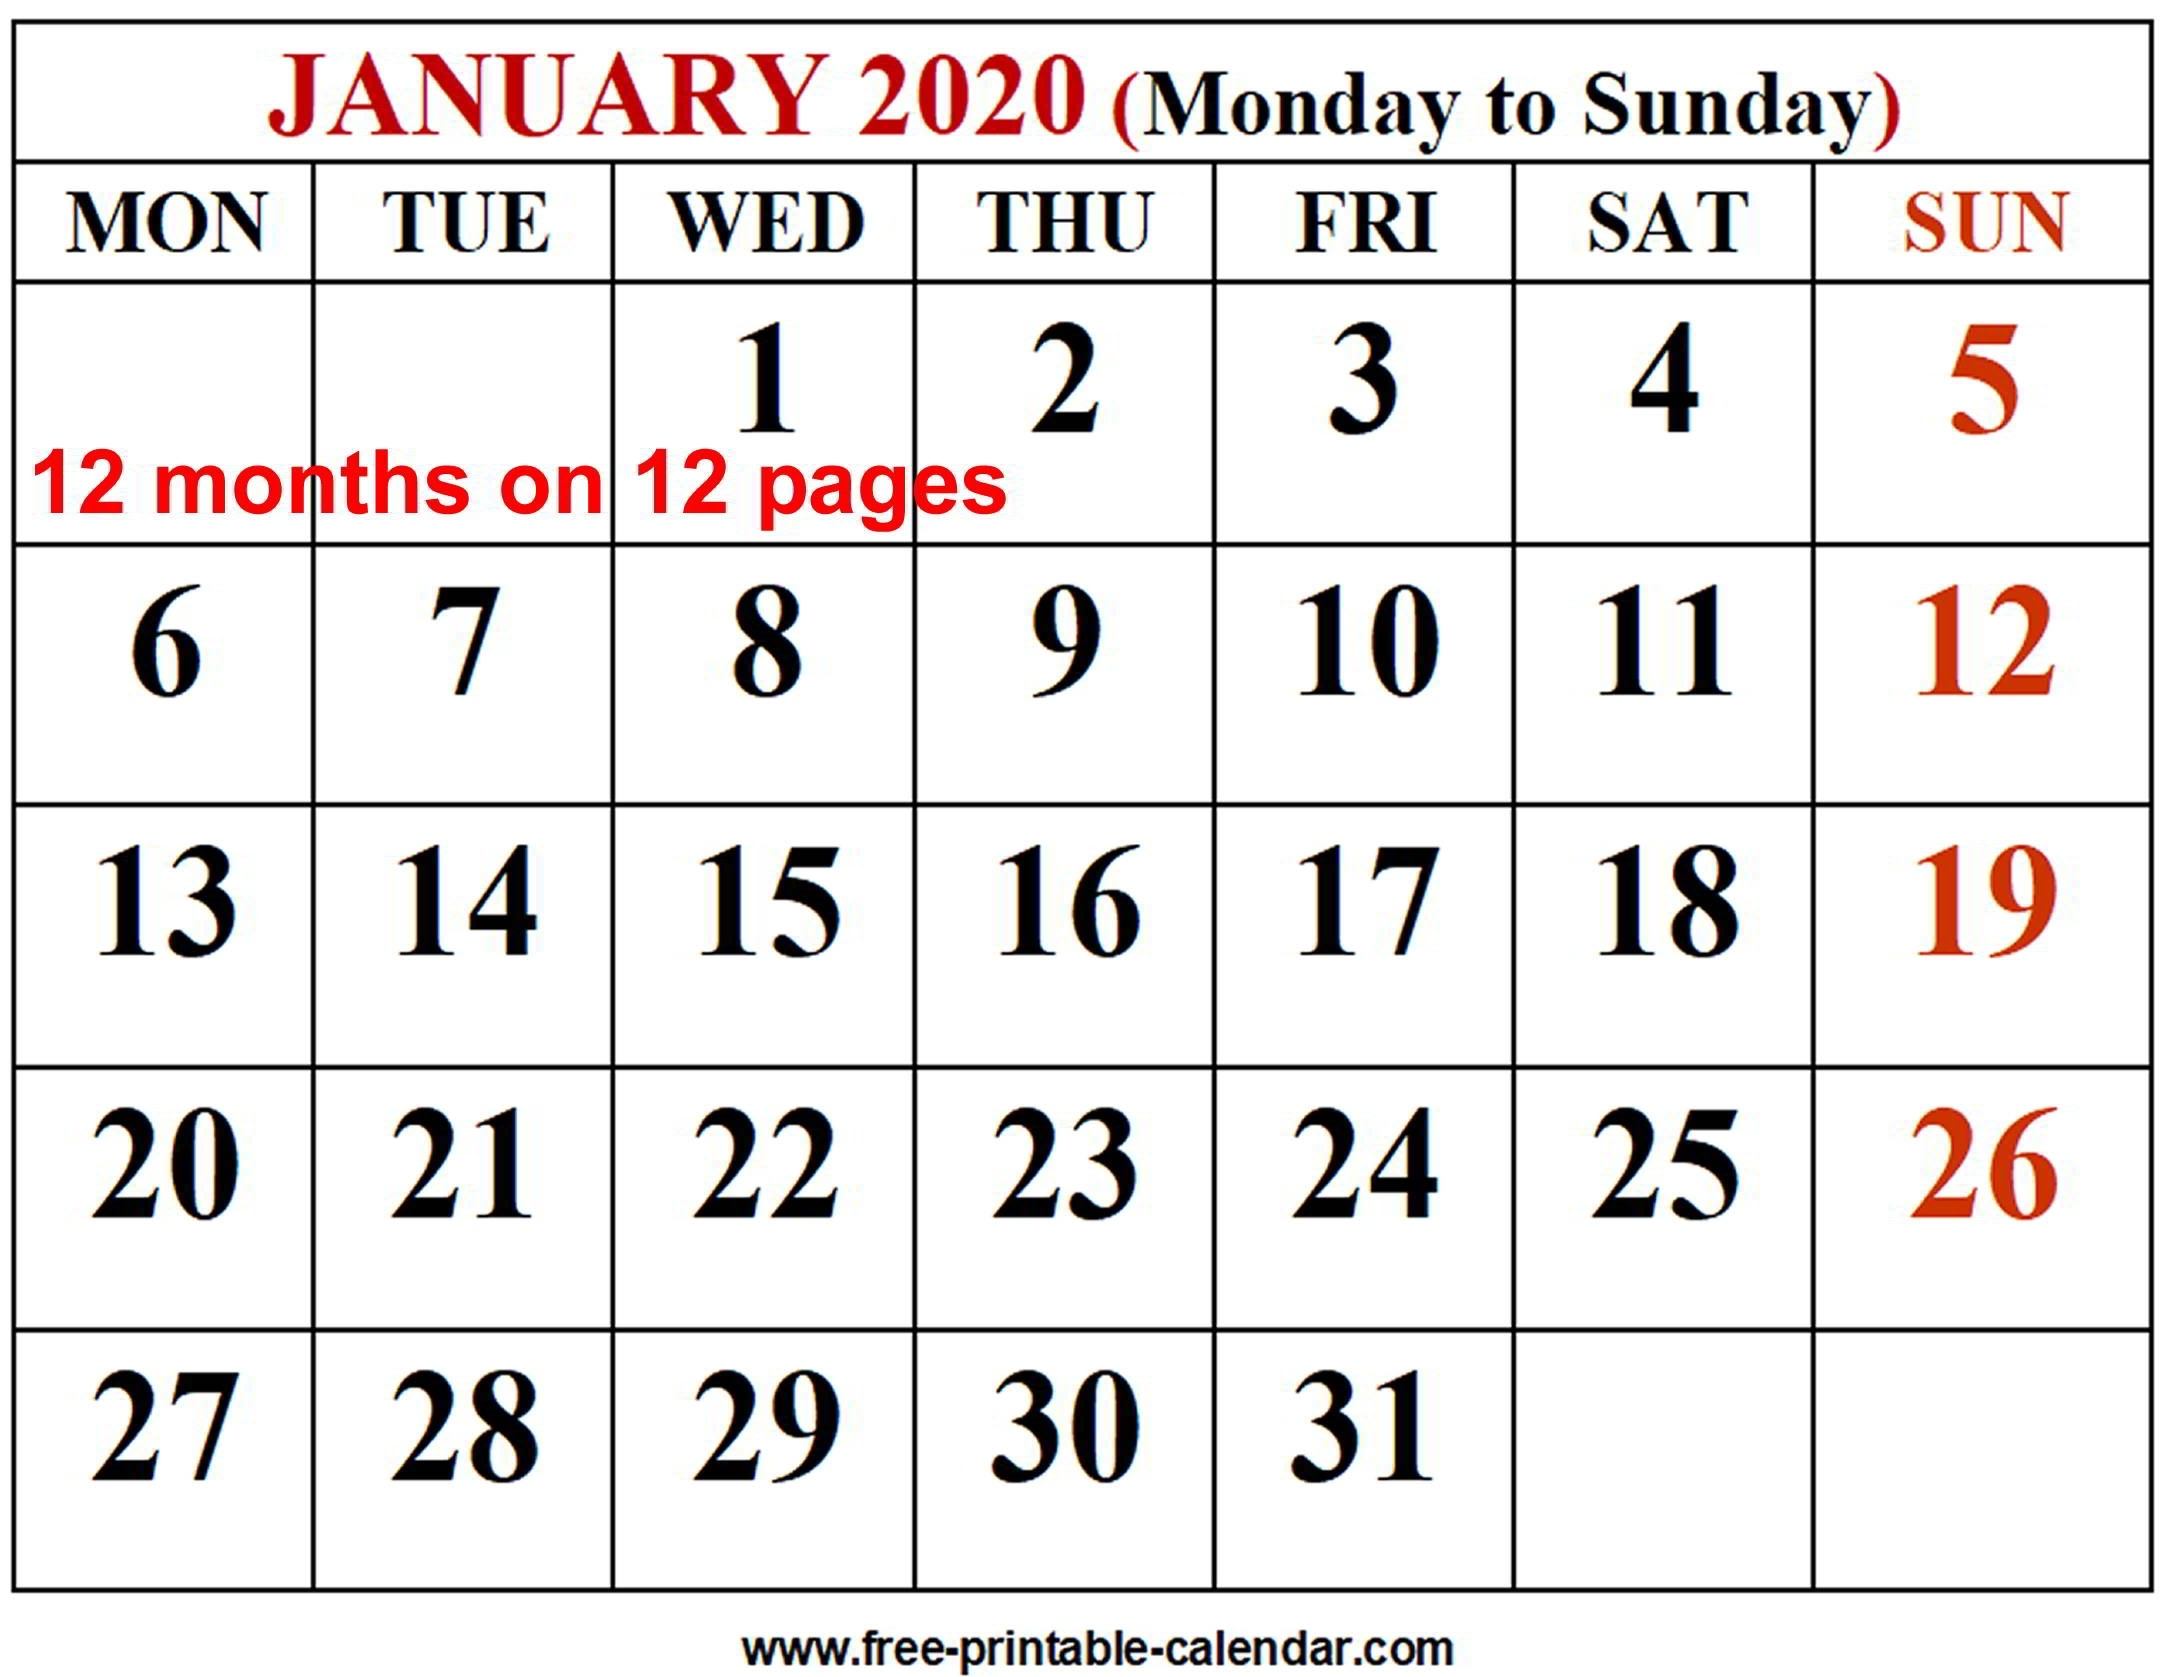 2020 Calendar Template - Free-Printable-Calendar Incredible Free 2 Page Monthly Calendar Templates 2020